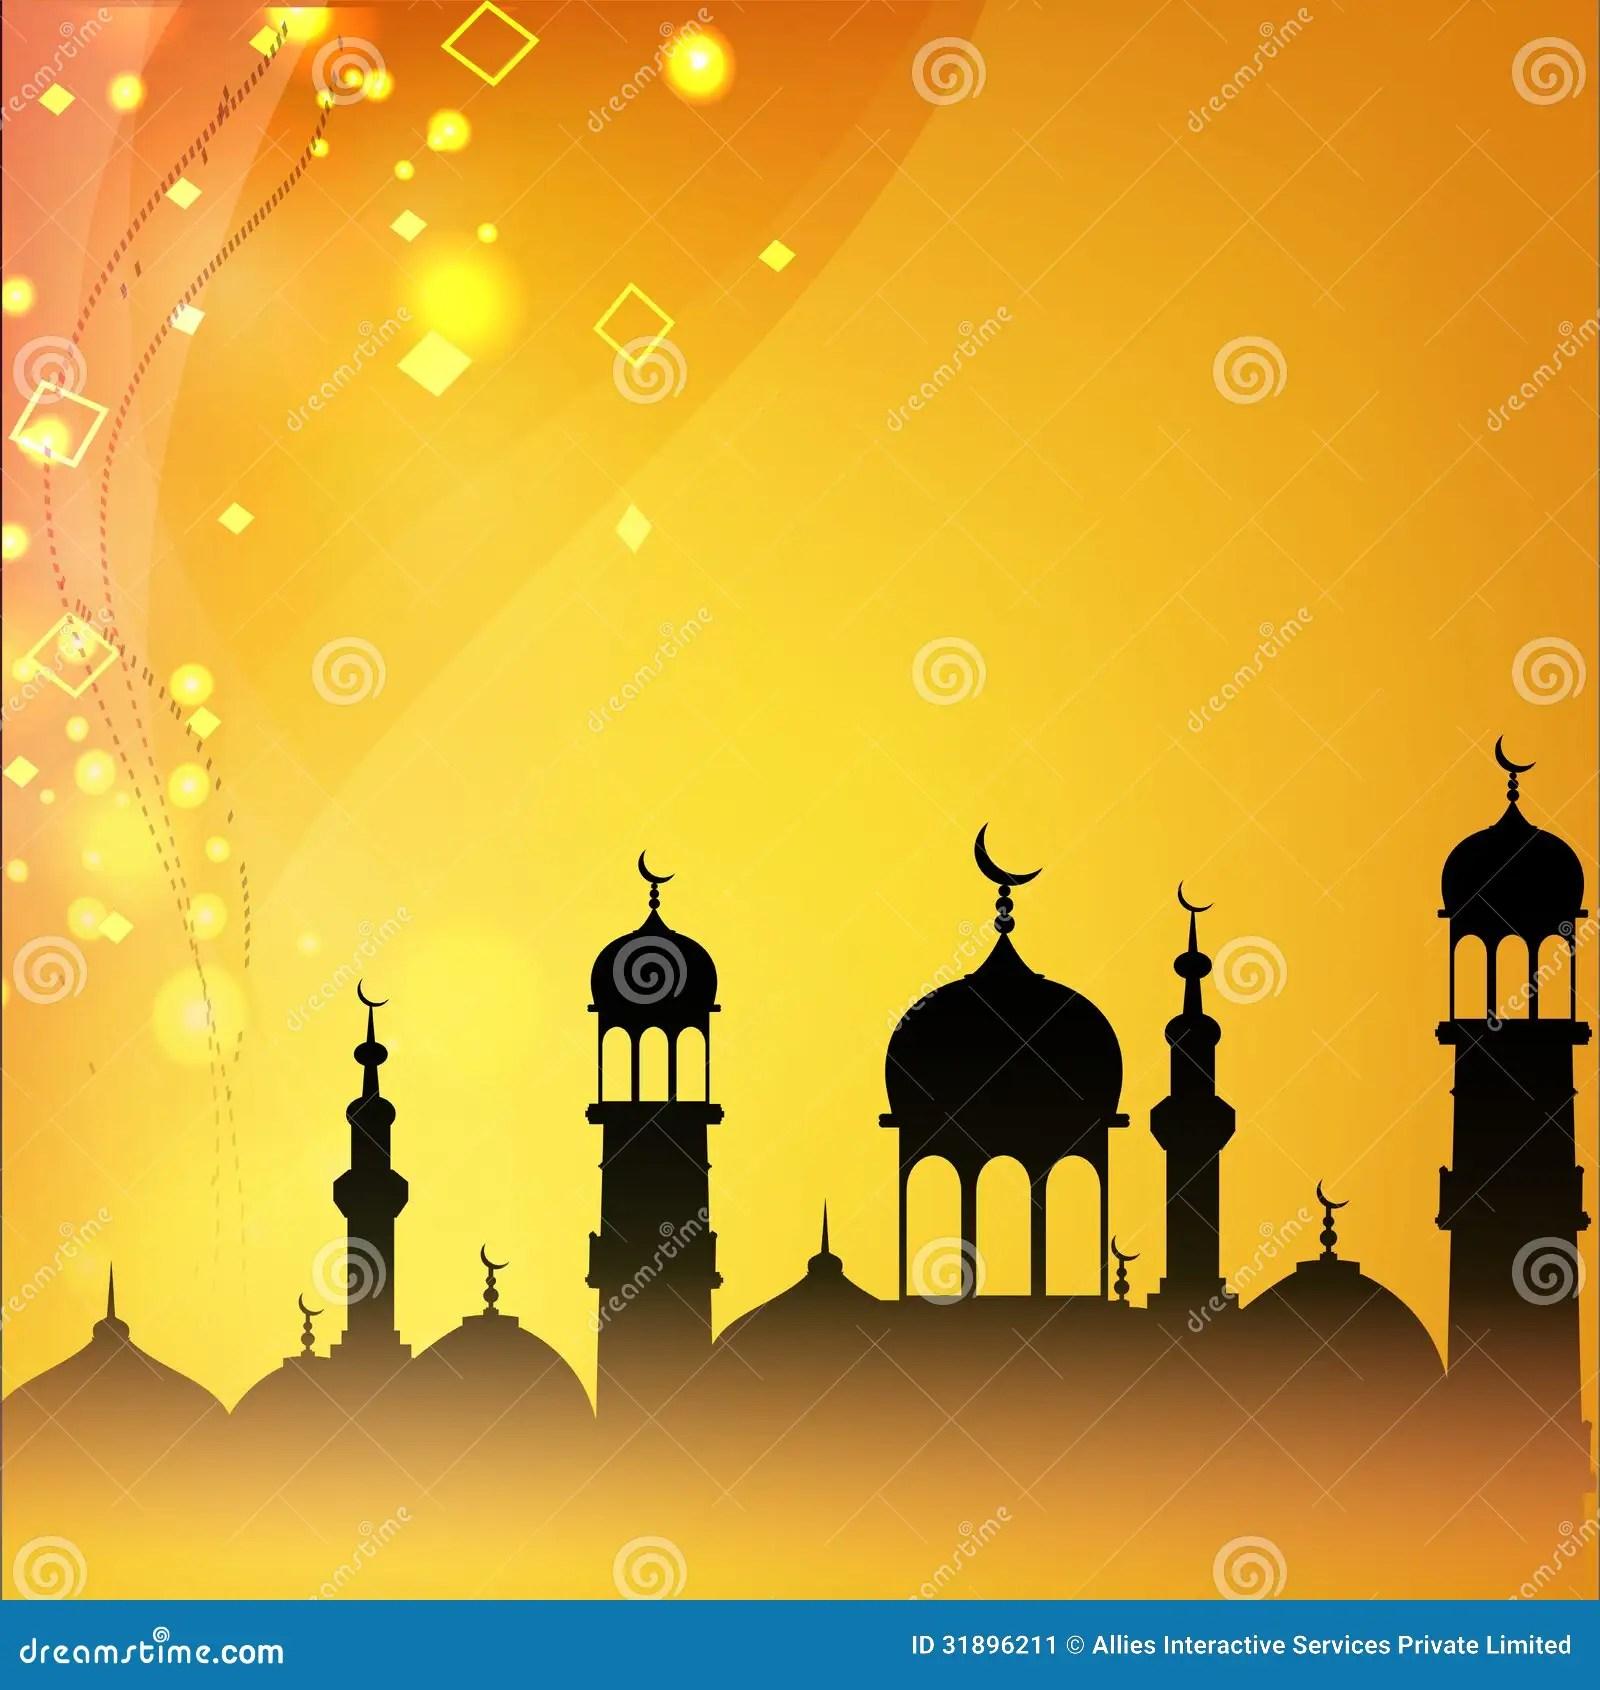 Ramadan Kareem background stock illustration Image of